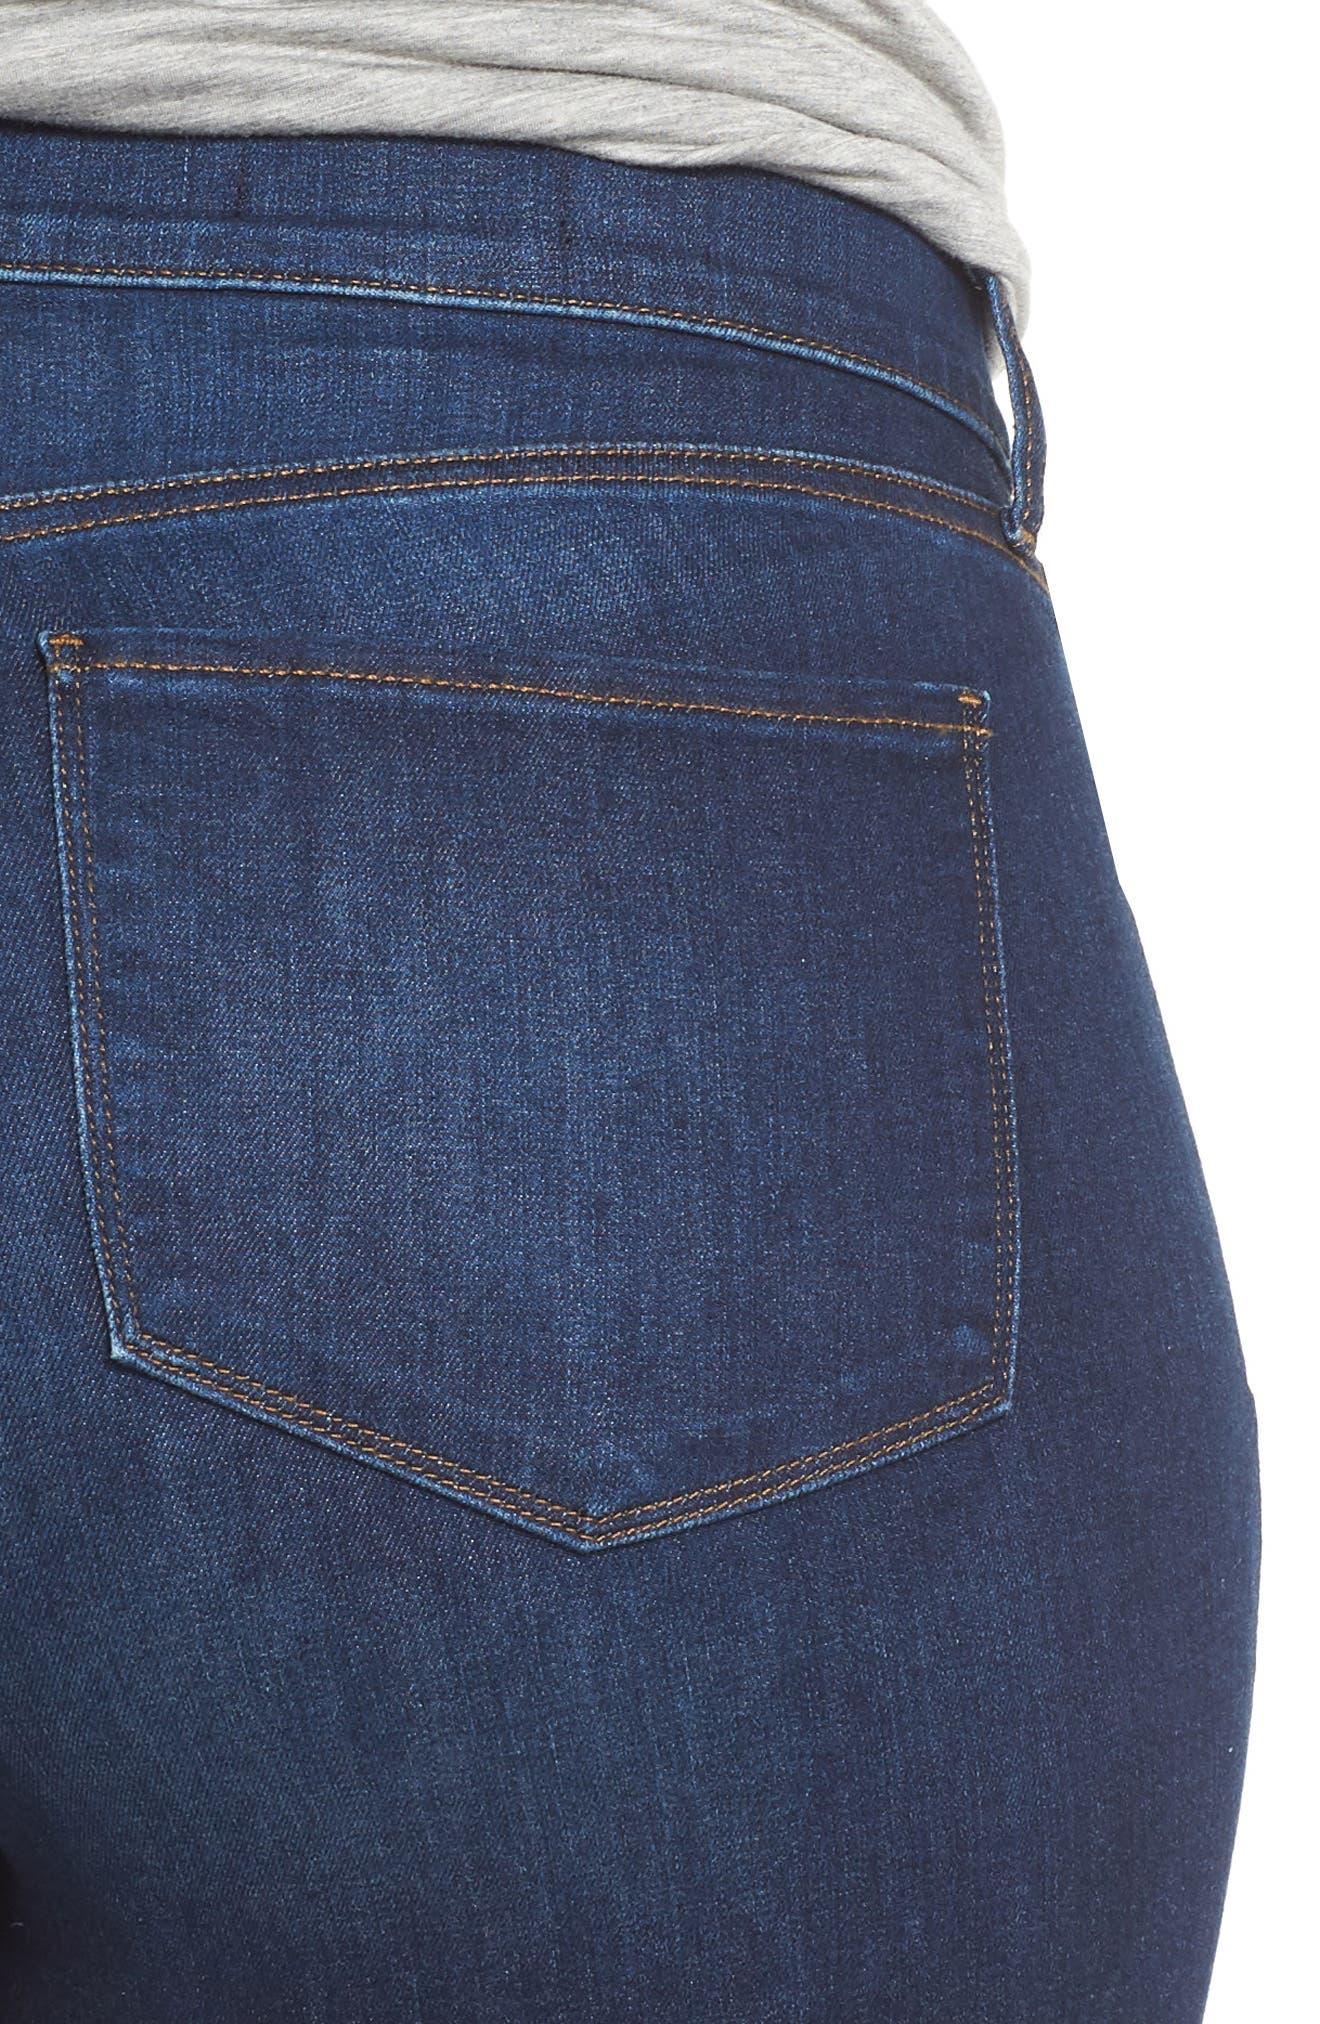 Briella Fray Hem Denim Bermuda Shorts,                             Alternate thumbnail 8, color,